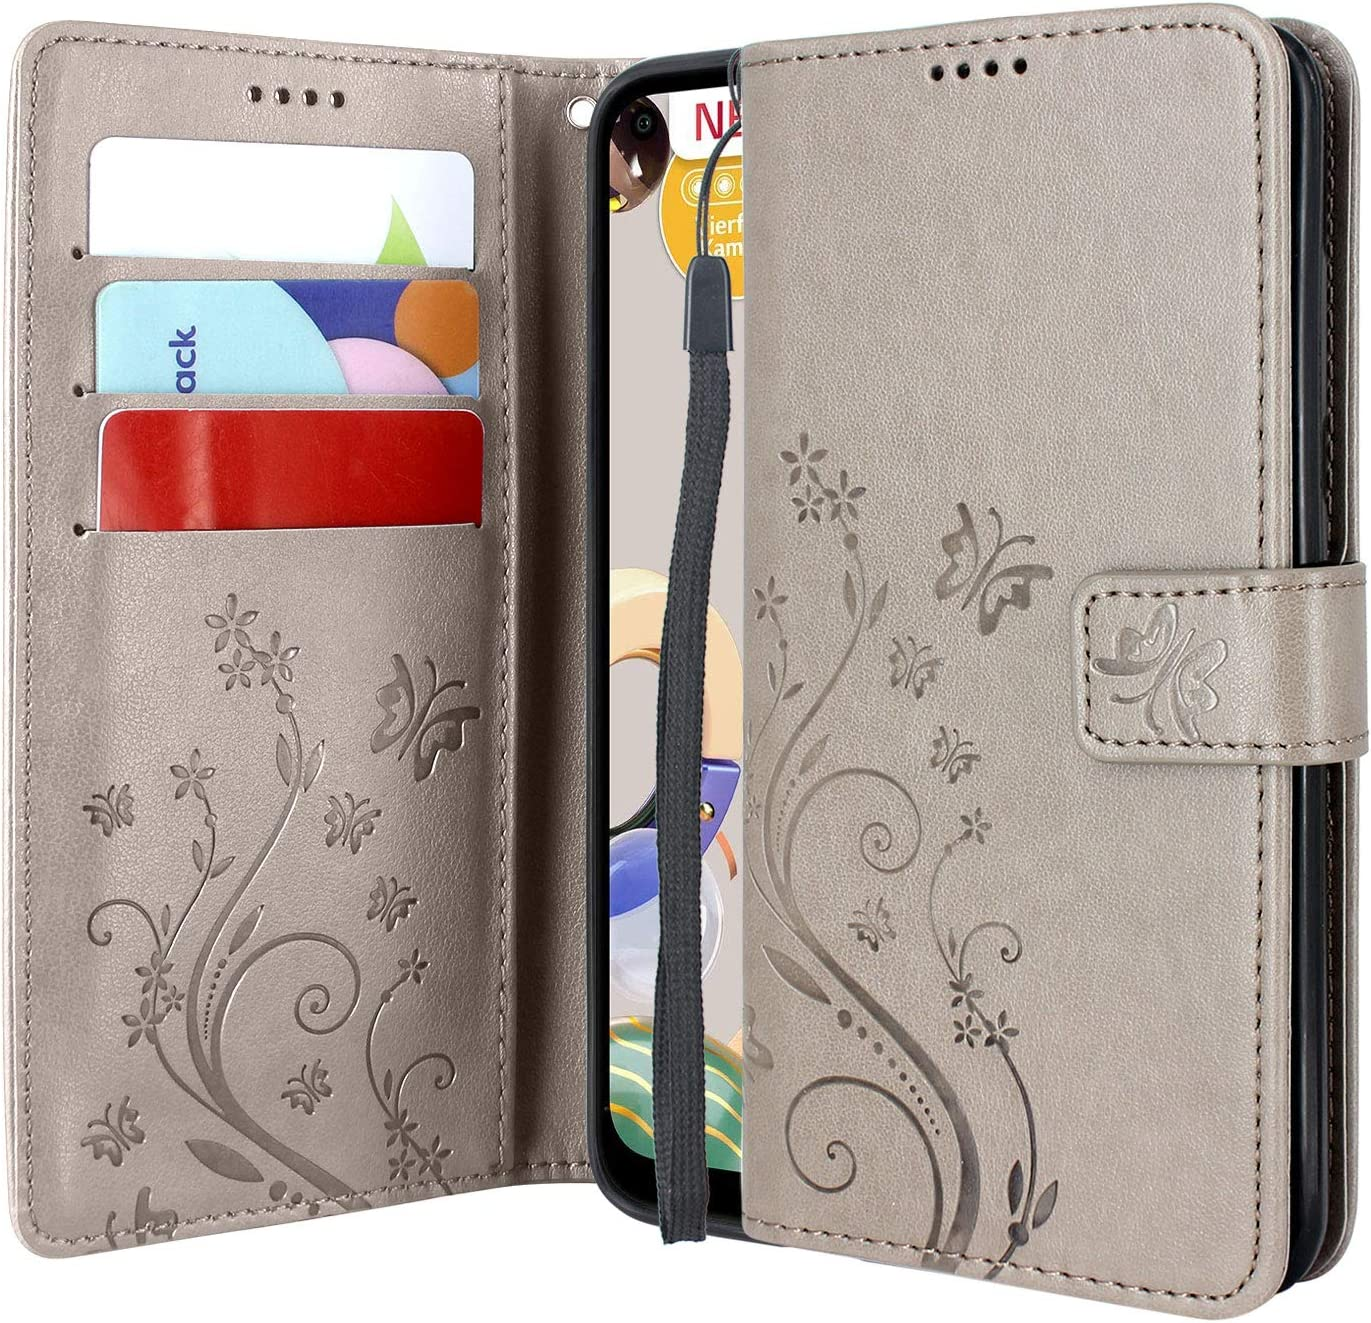 CMID Funda LG K61, PU Cuero Libro Billetera Tapa Antigolpes Protective [Función de Soporte] Cartera Carcasa Case para LG K61 (Gris): Amazon.es: Electrónica